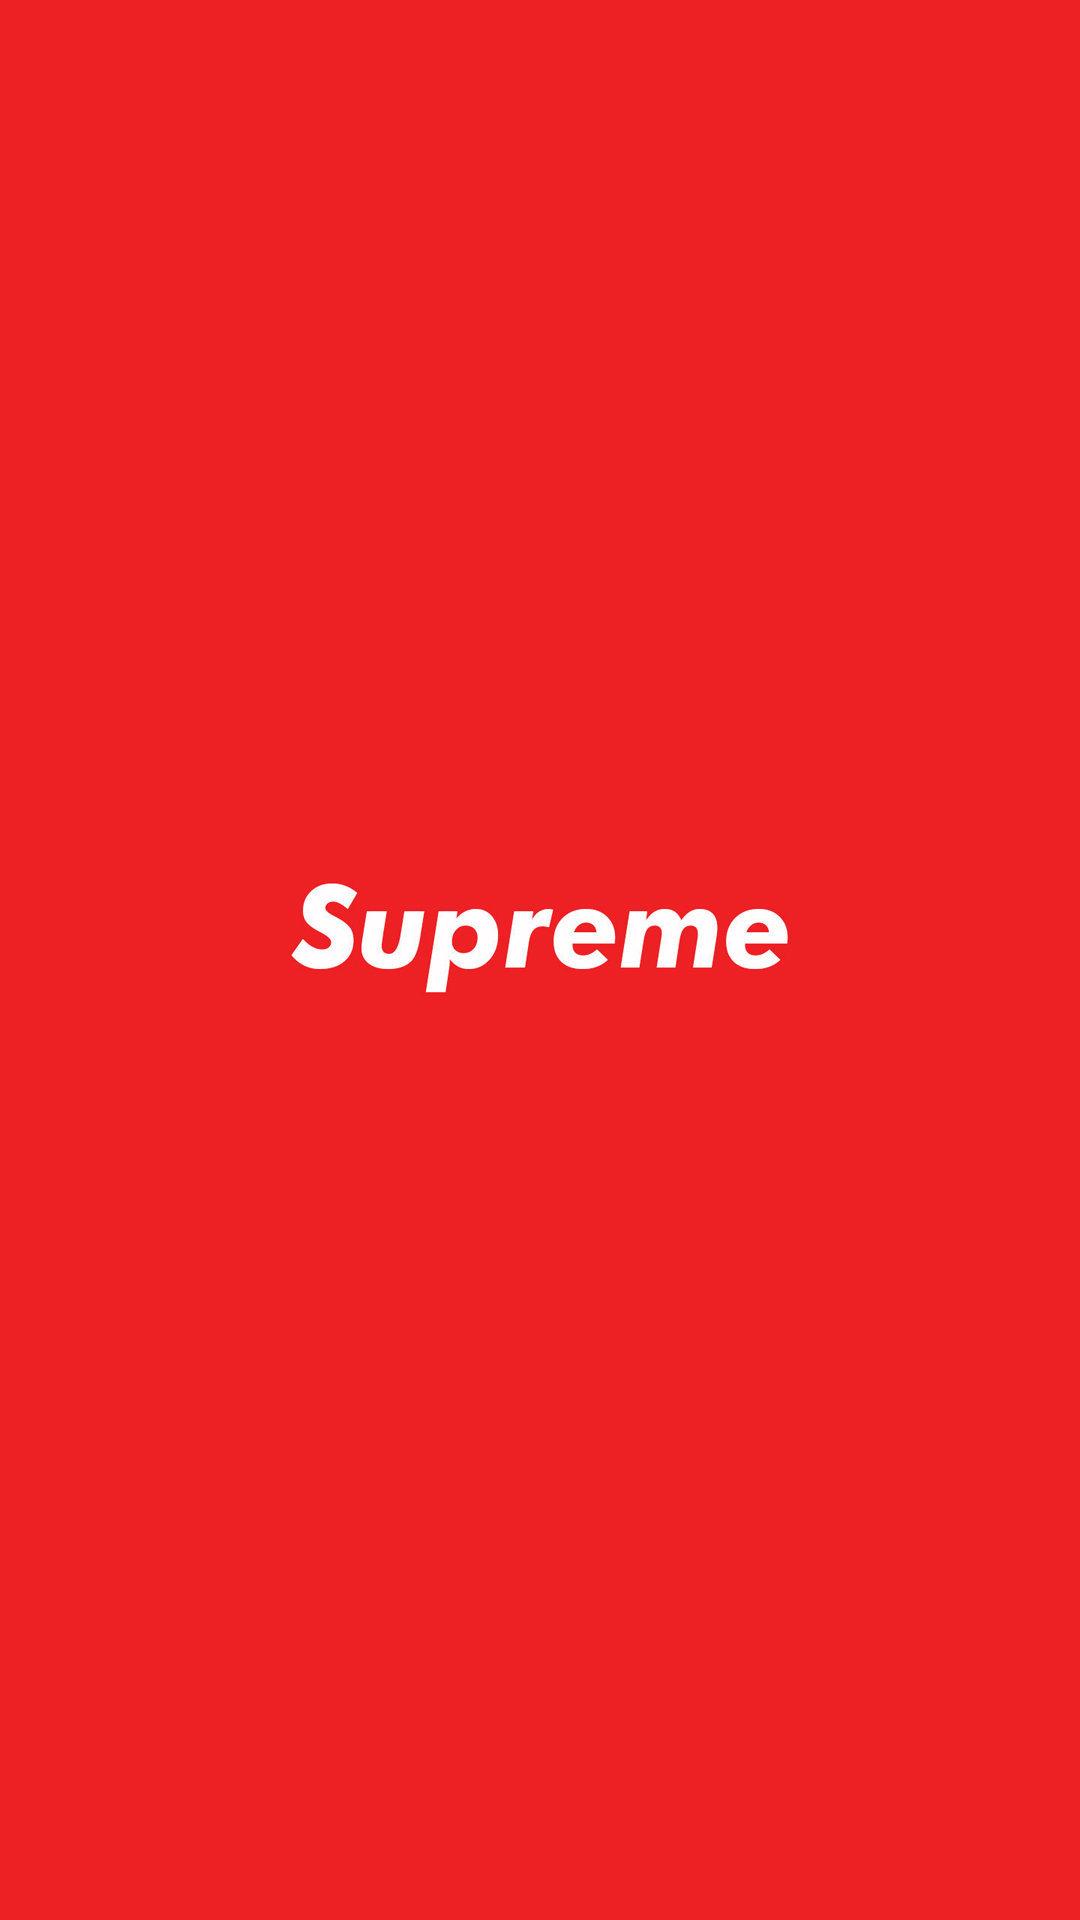 supreme box logo wallpaper iphone